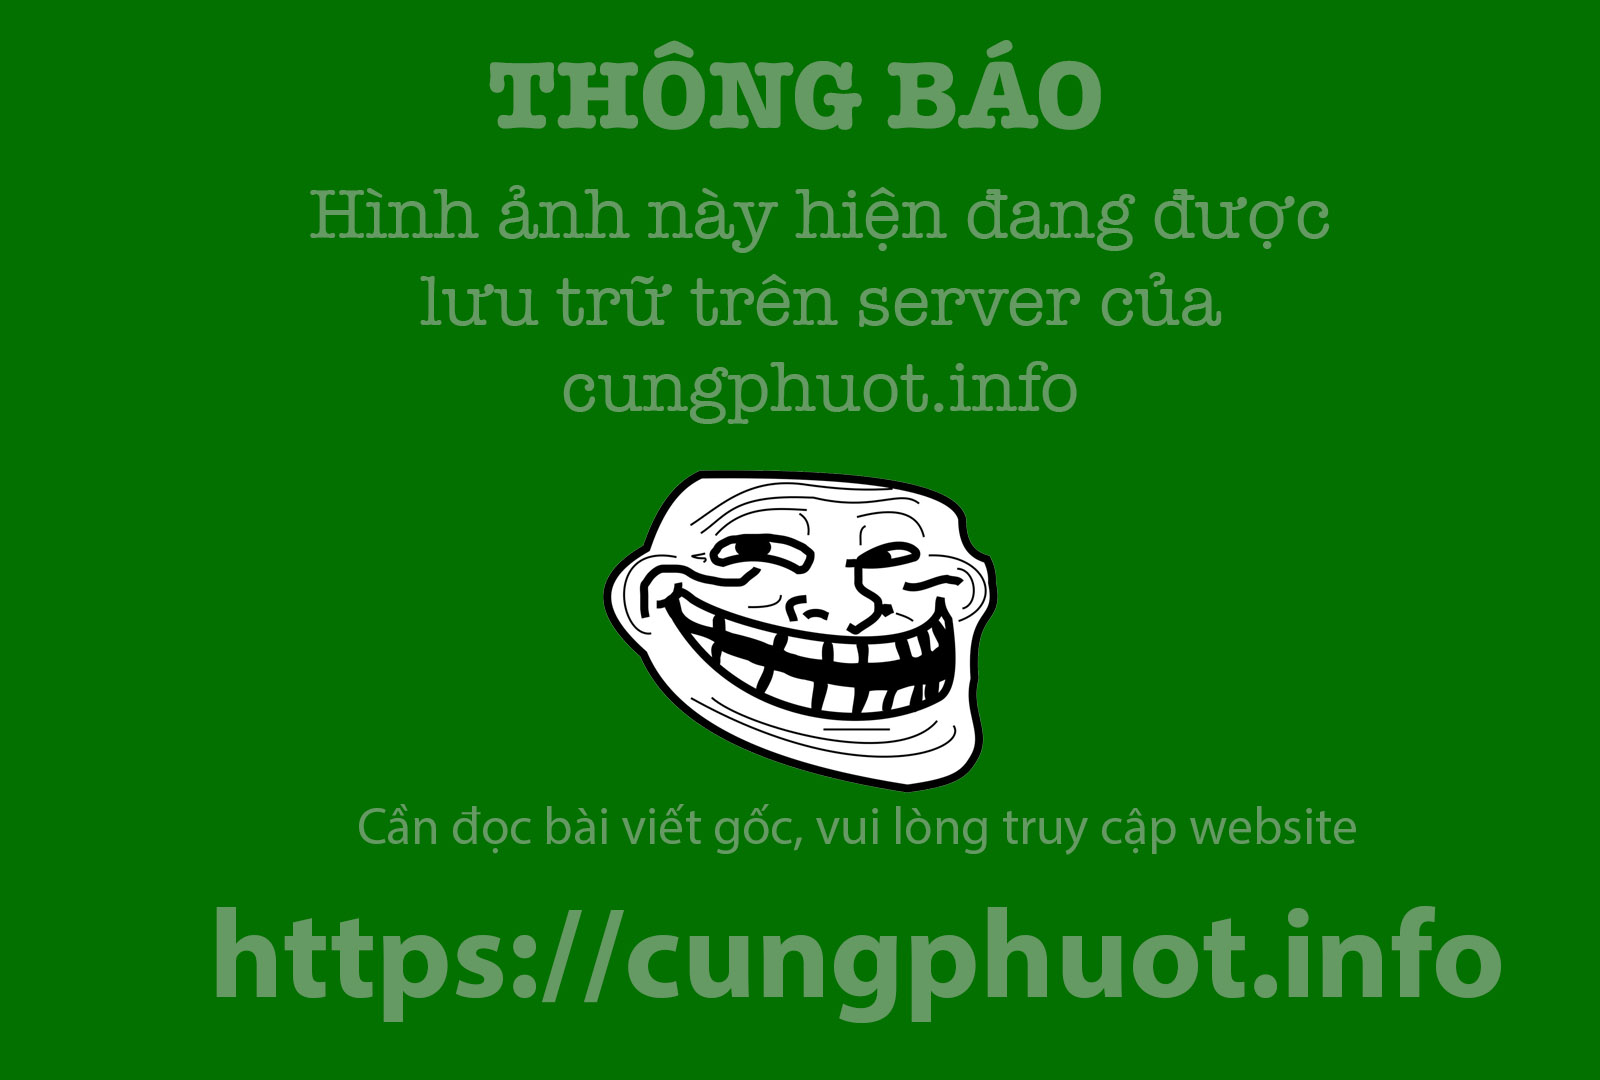 Co do Lam Kinh nhin tu tren cao hinh anh 8